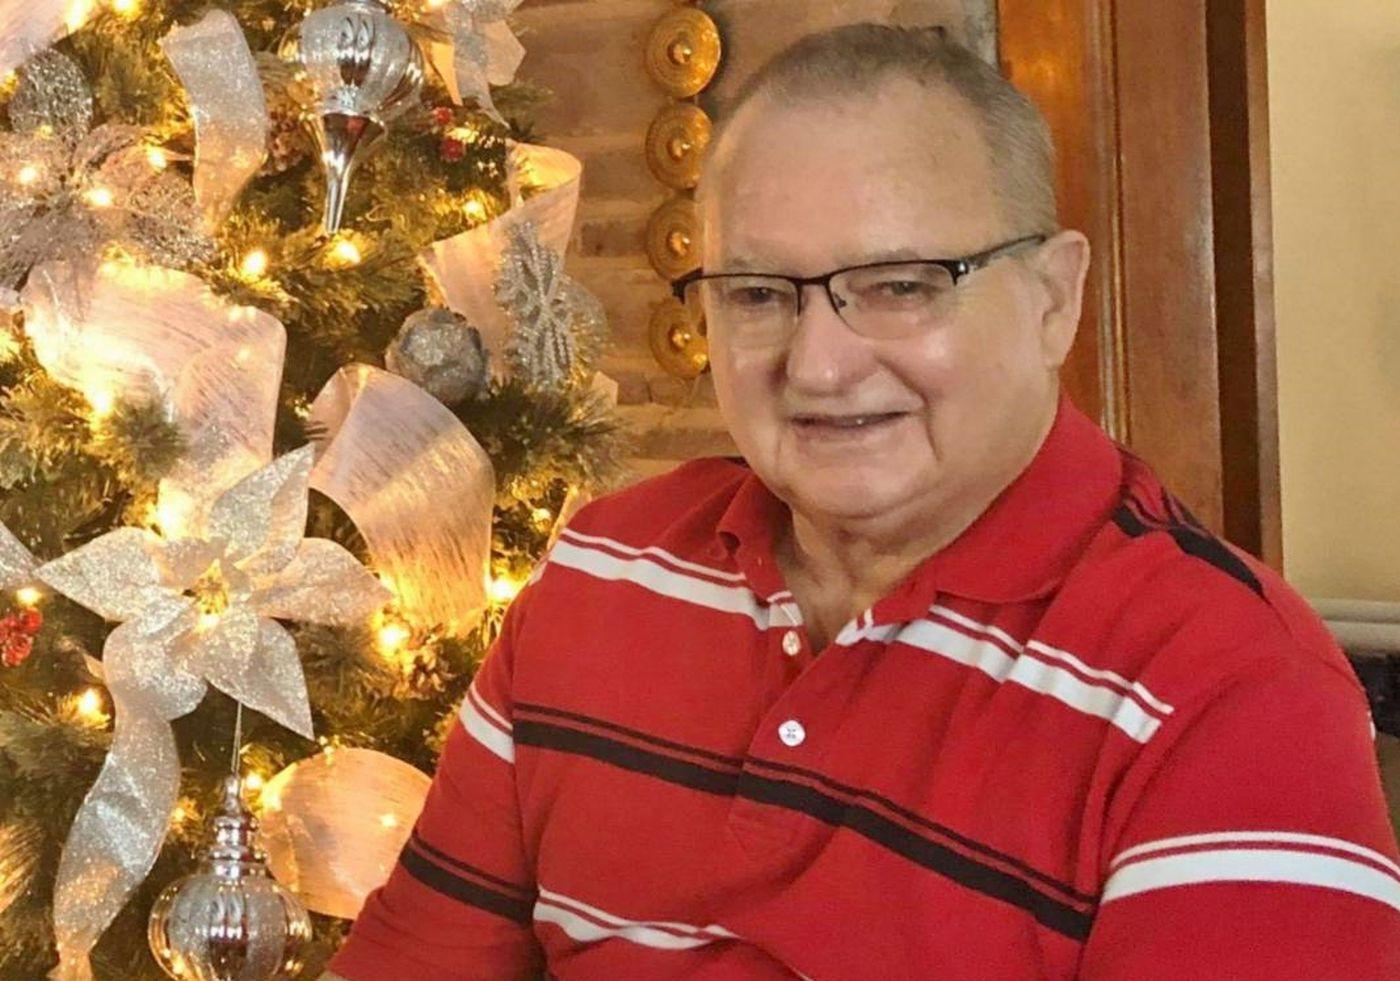 Christmas Parade 2020 Croghan Ny Dr. Richard Frank Higby, 74, of Croghan